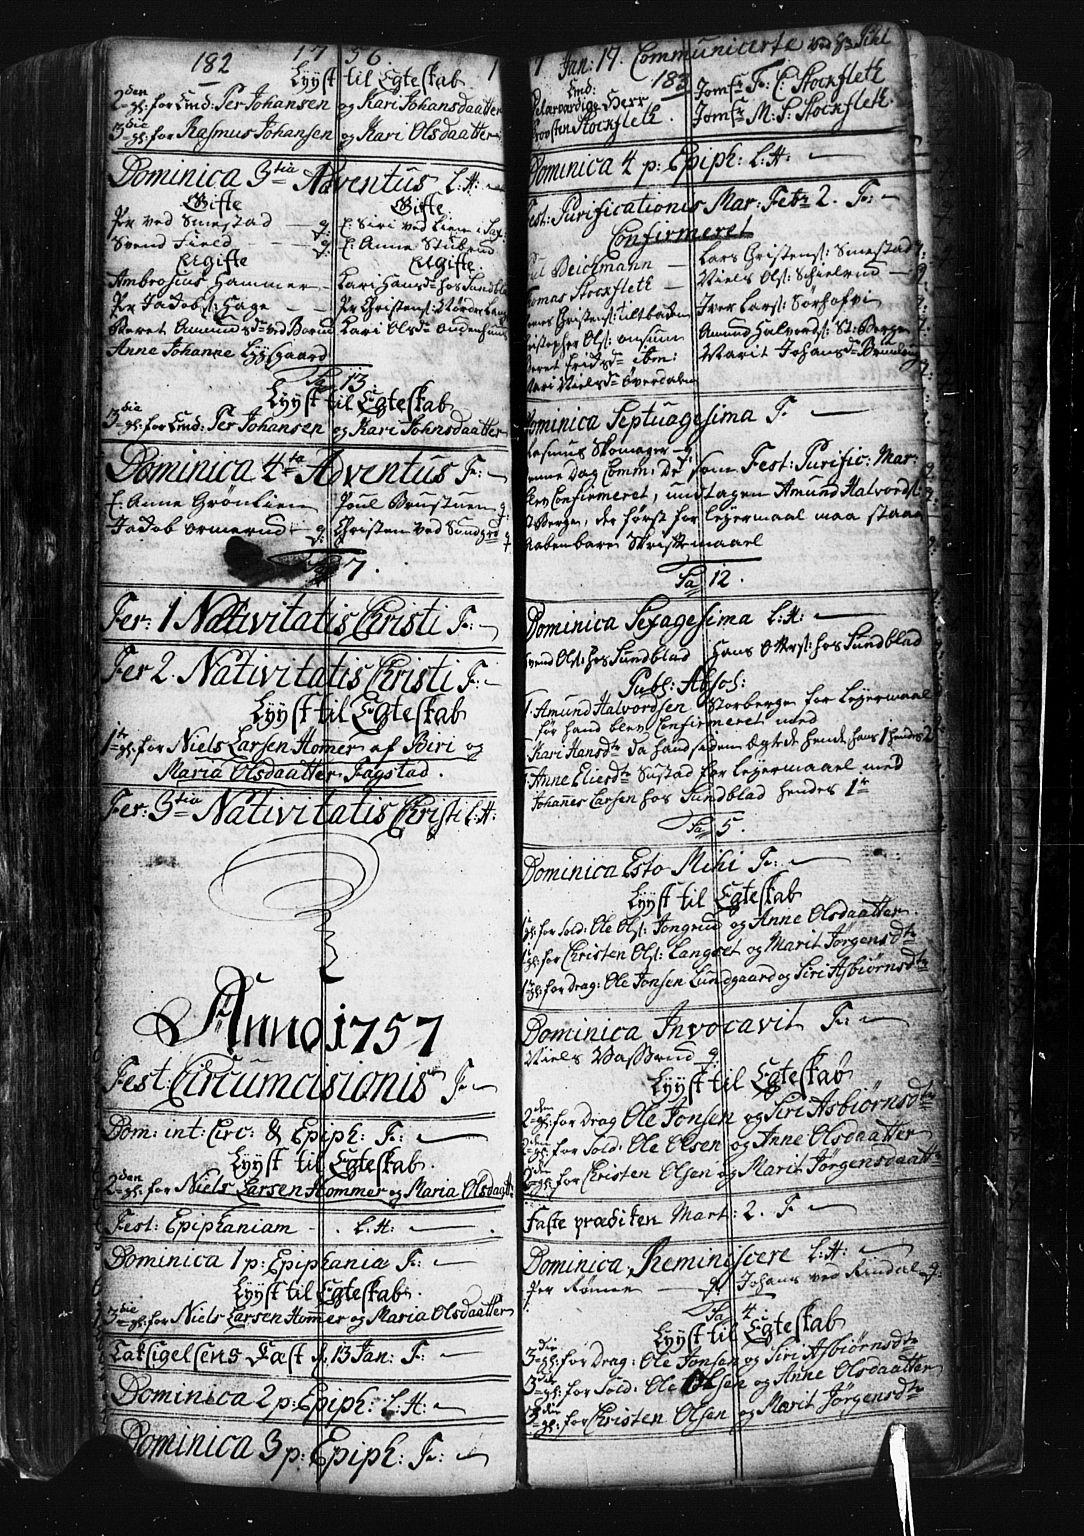 SAH, Fåberg prestekontor, Klokkerbok nr. 1, 1727-1767, s. 182-183